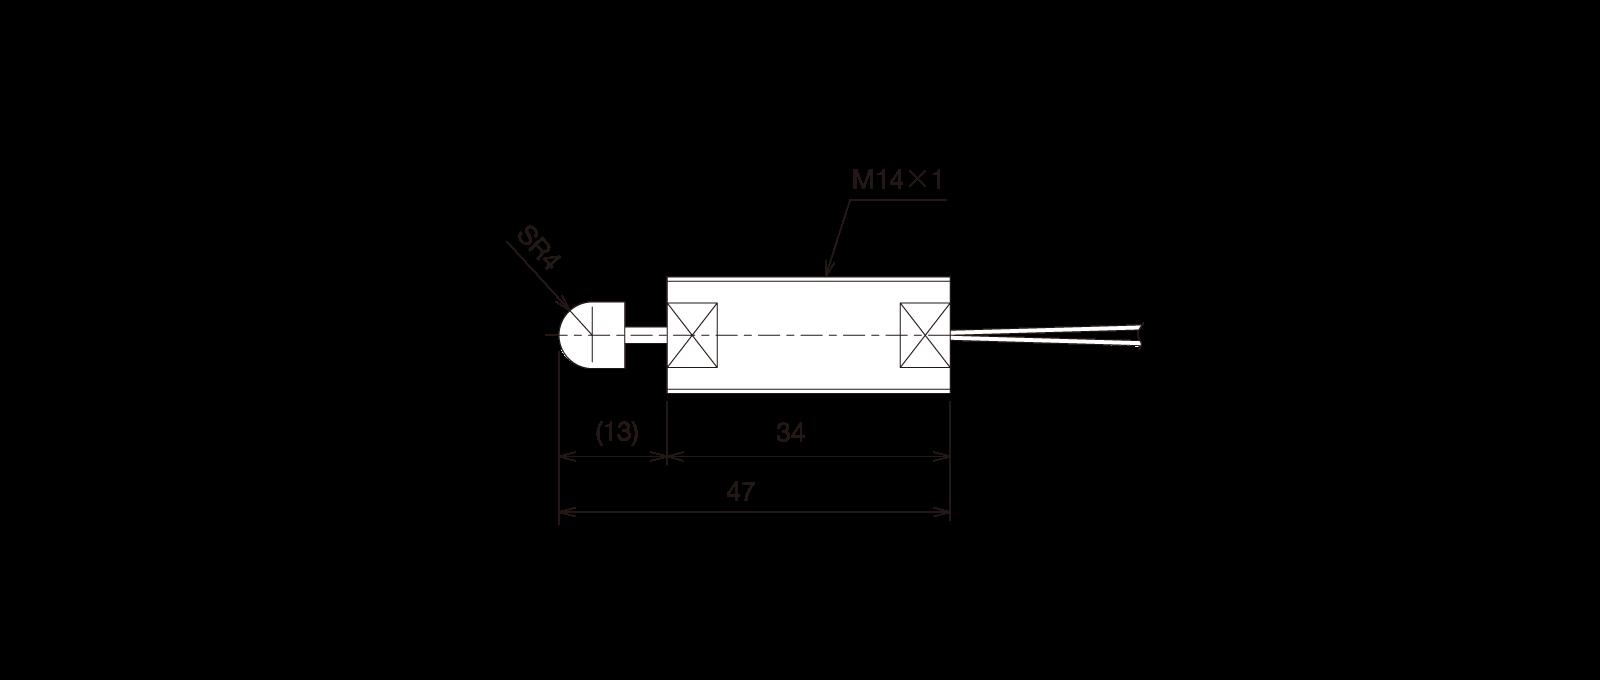 GN-CSK141Bの外径寸法図1